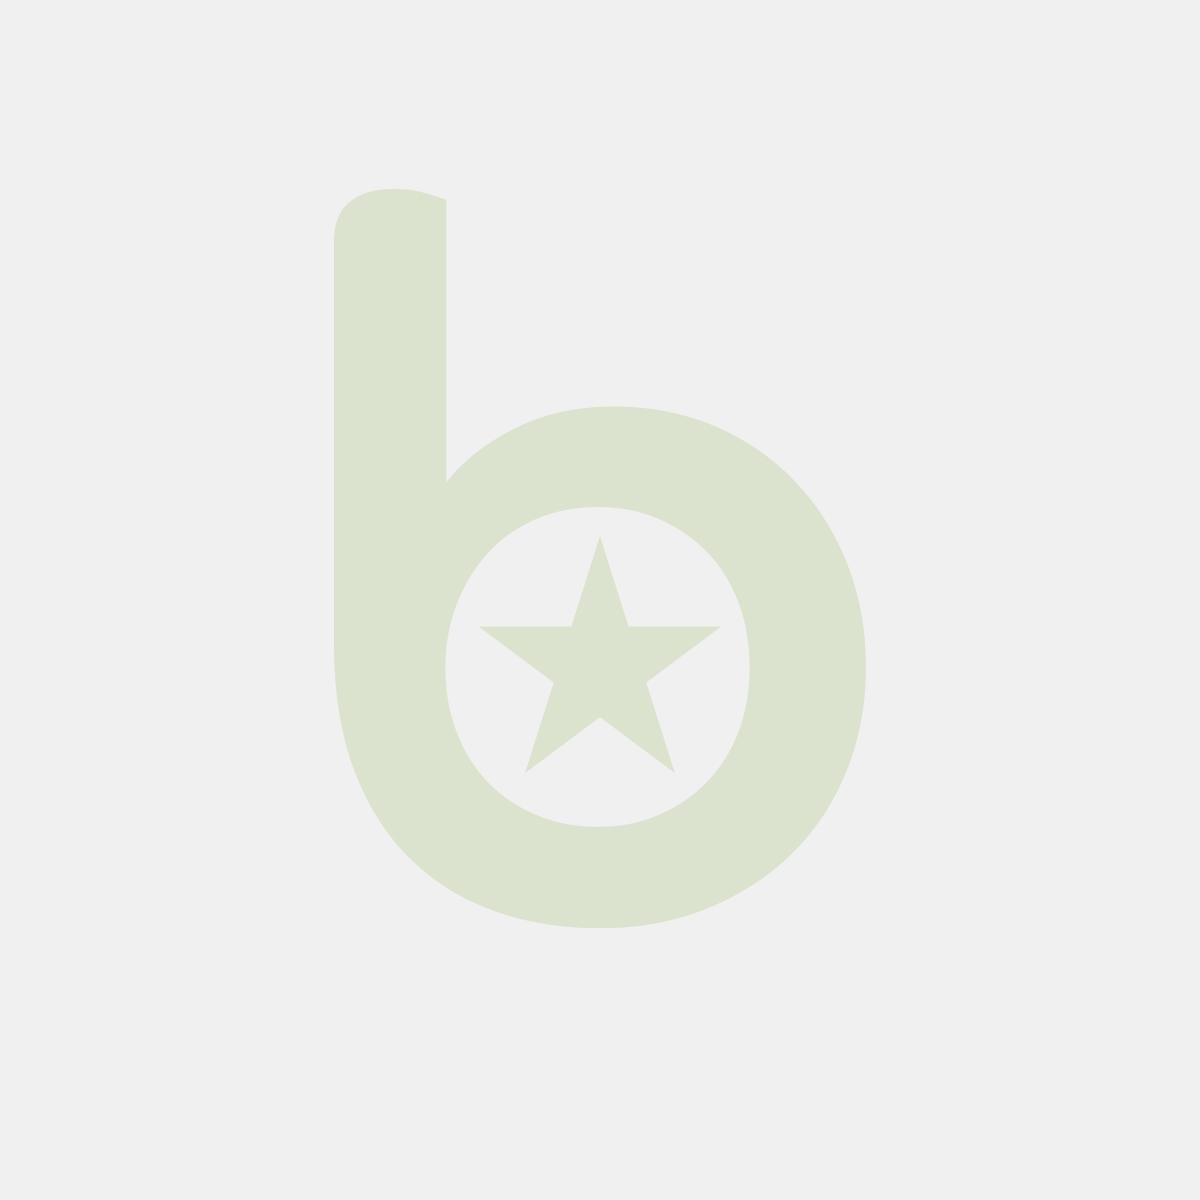 Folia bąbelkowa 10m x 0,5m DATURA